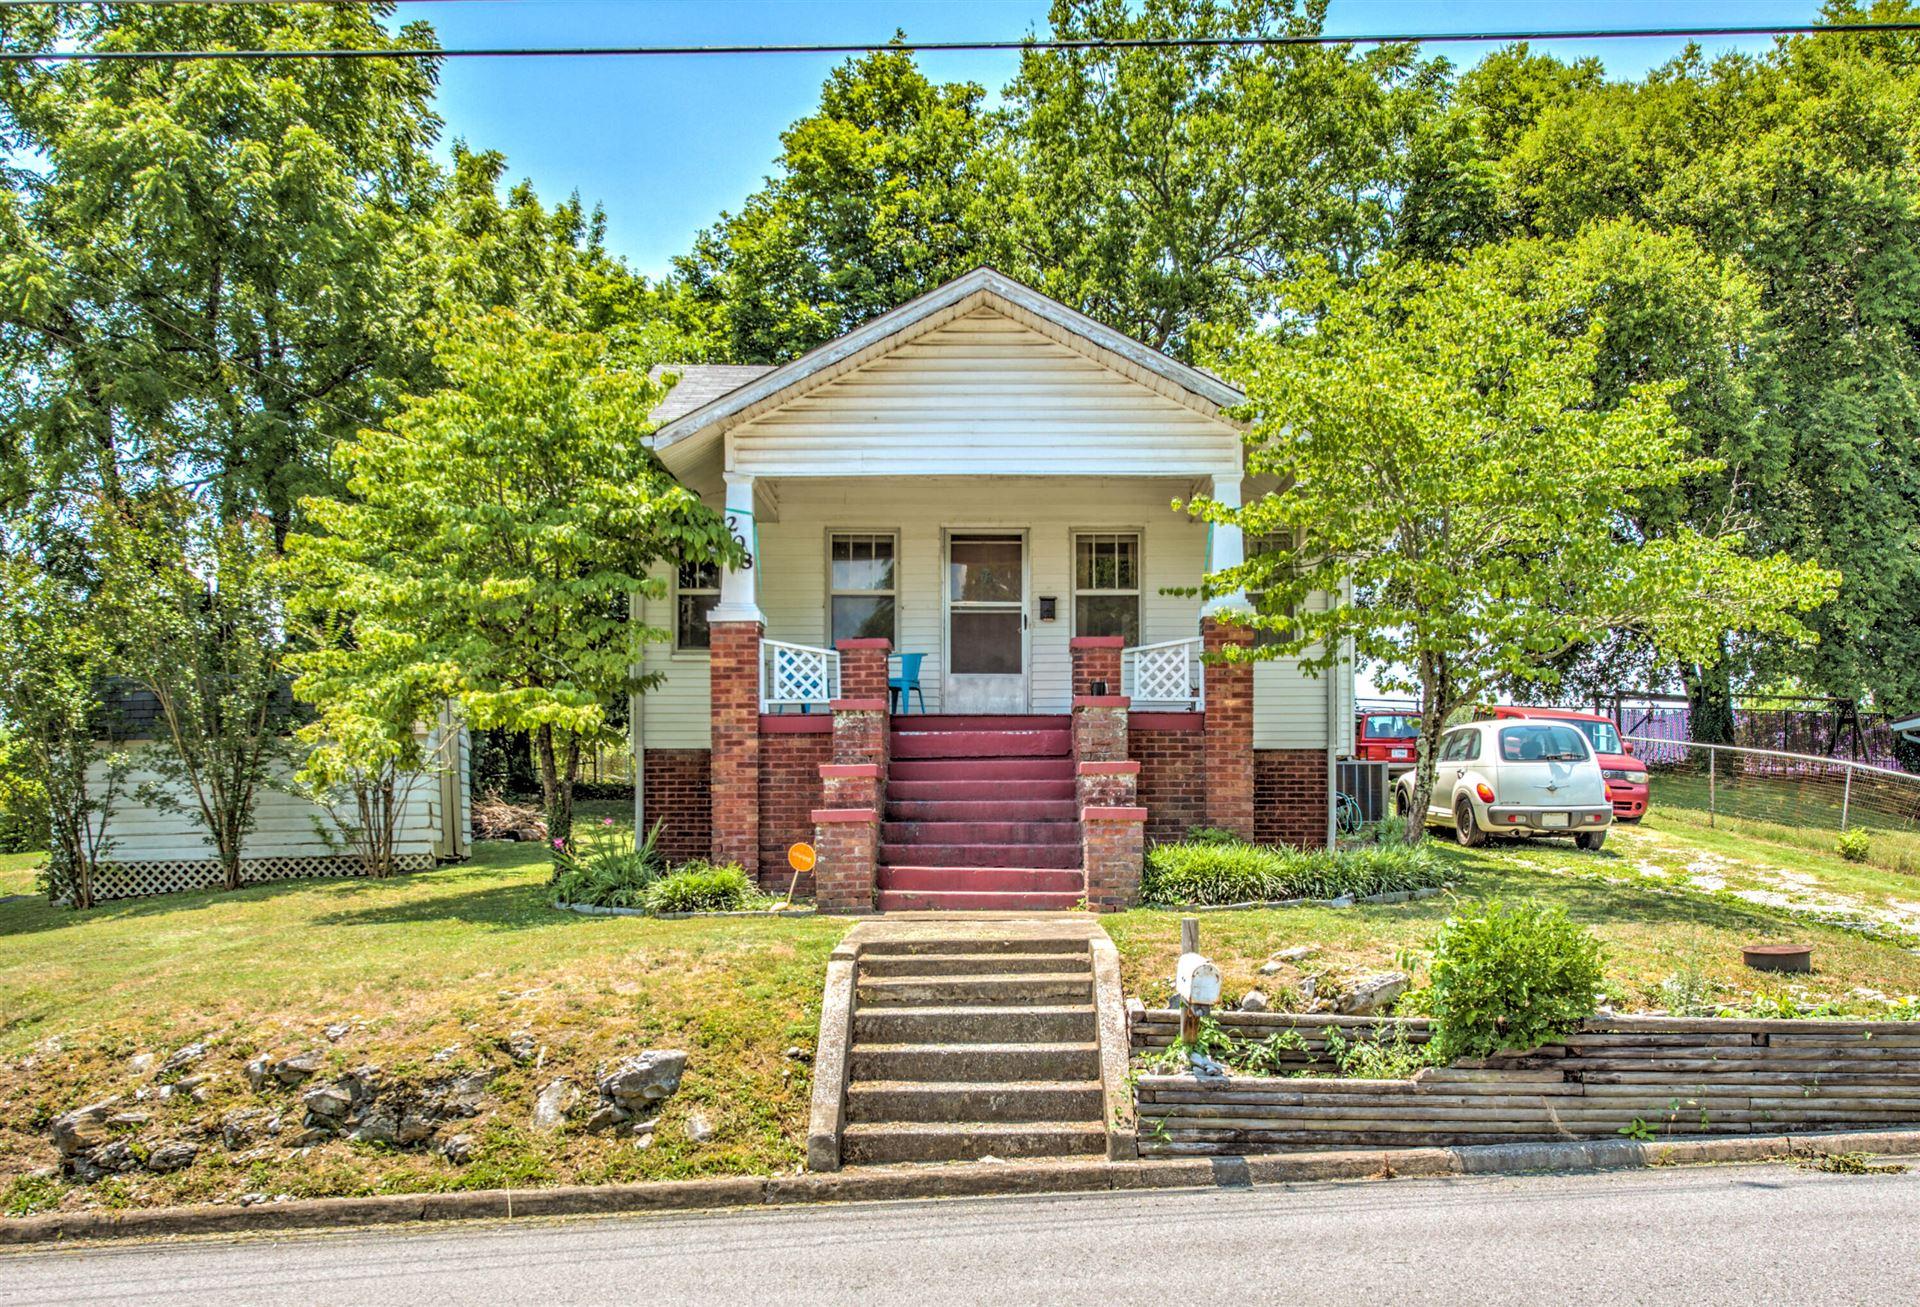 Photo of 208 Lamar Ave, Clinton, TN 37716 (MLS # 1159425)